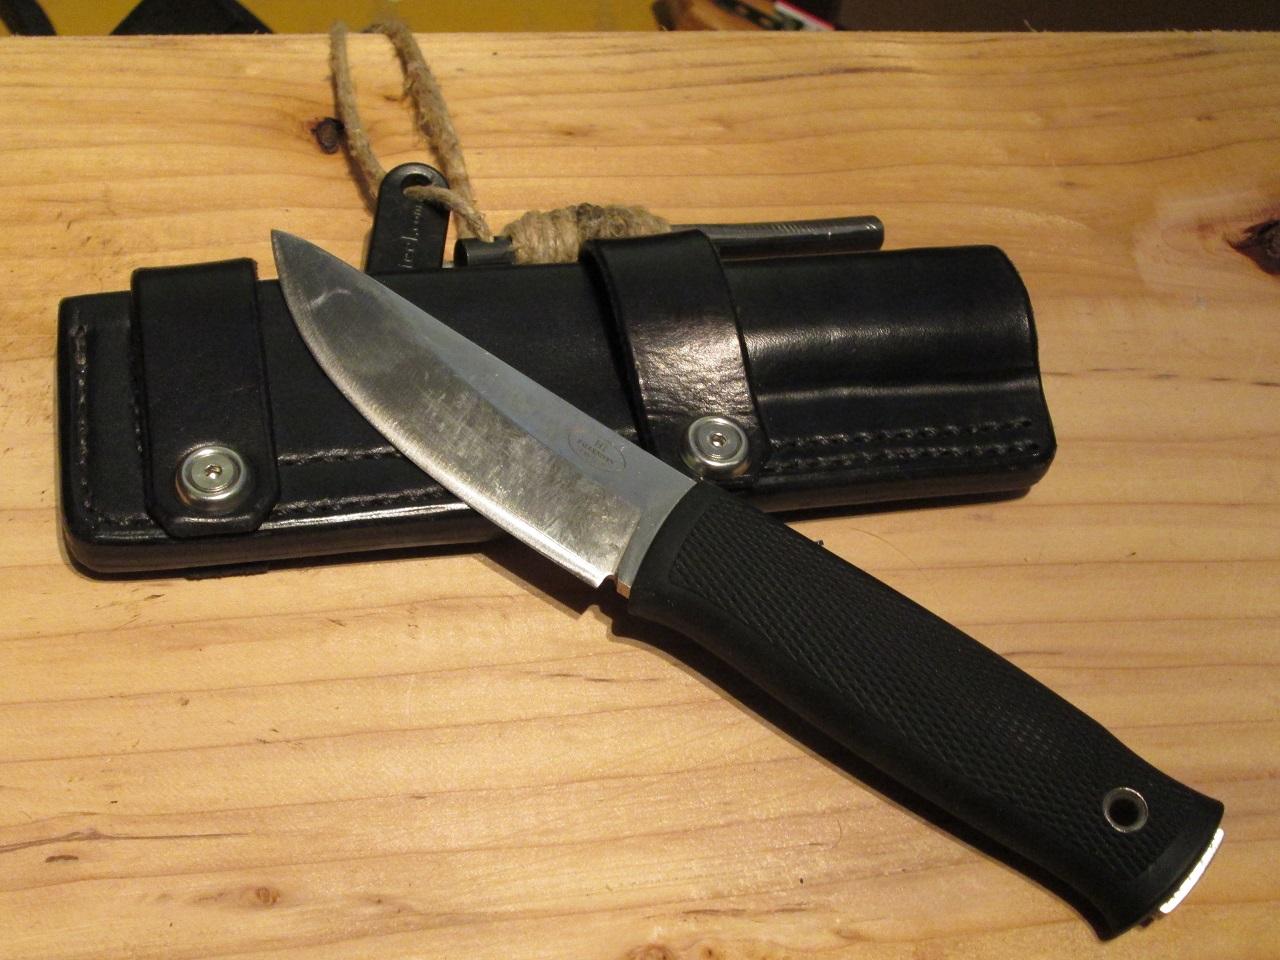 My Fallkniven H1